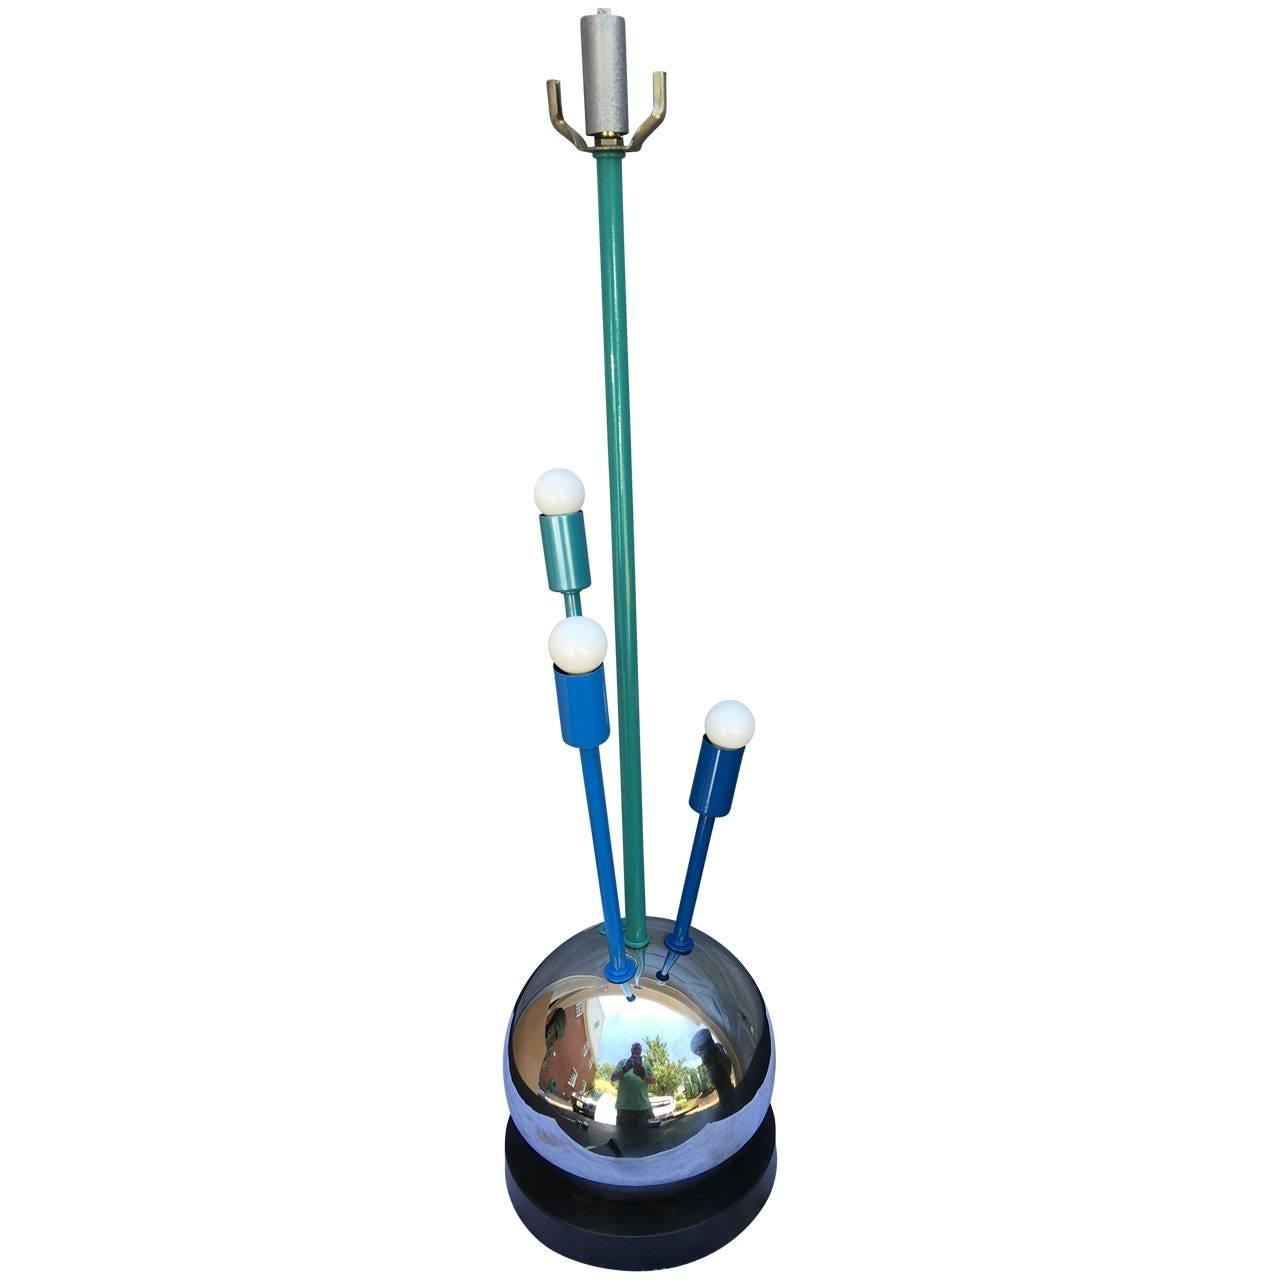 Mid-Century Modern Atomic Age Sputnik Table Lamp